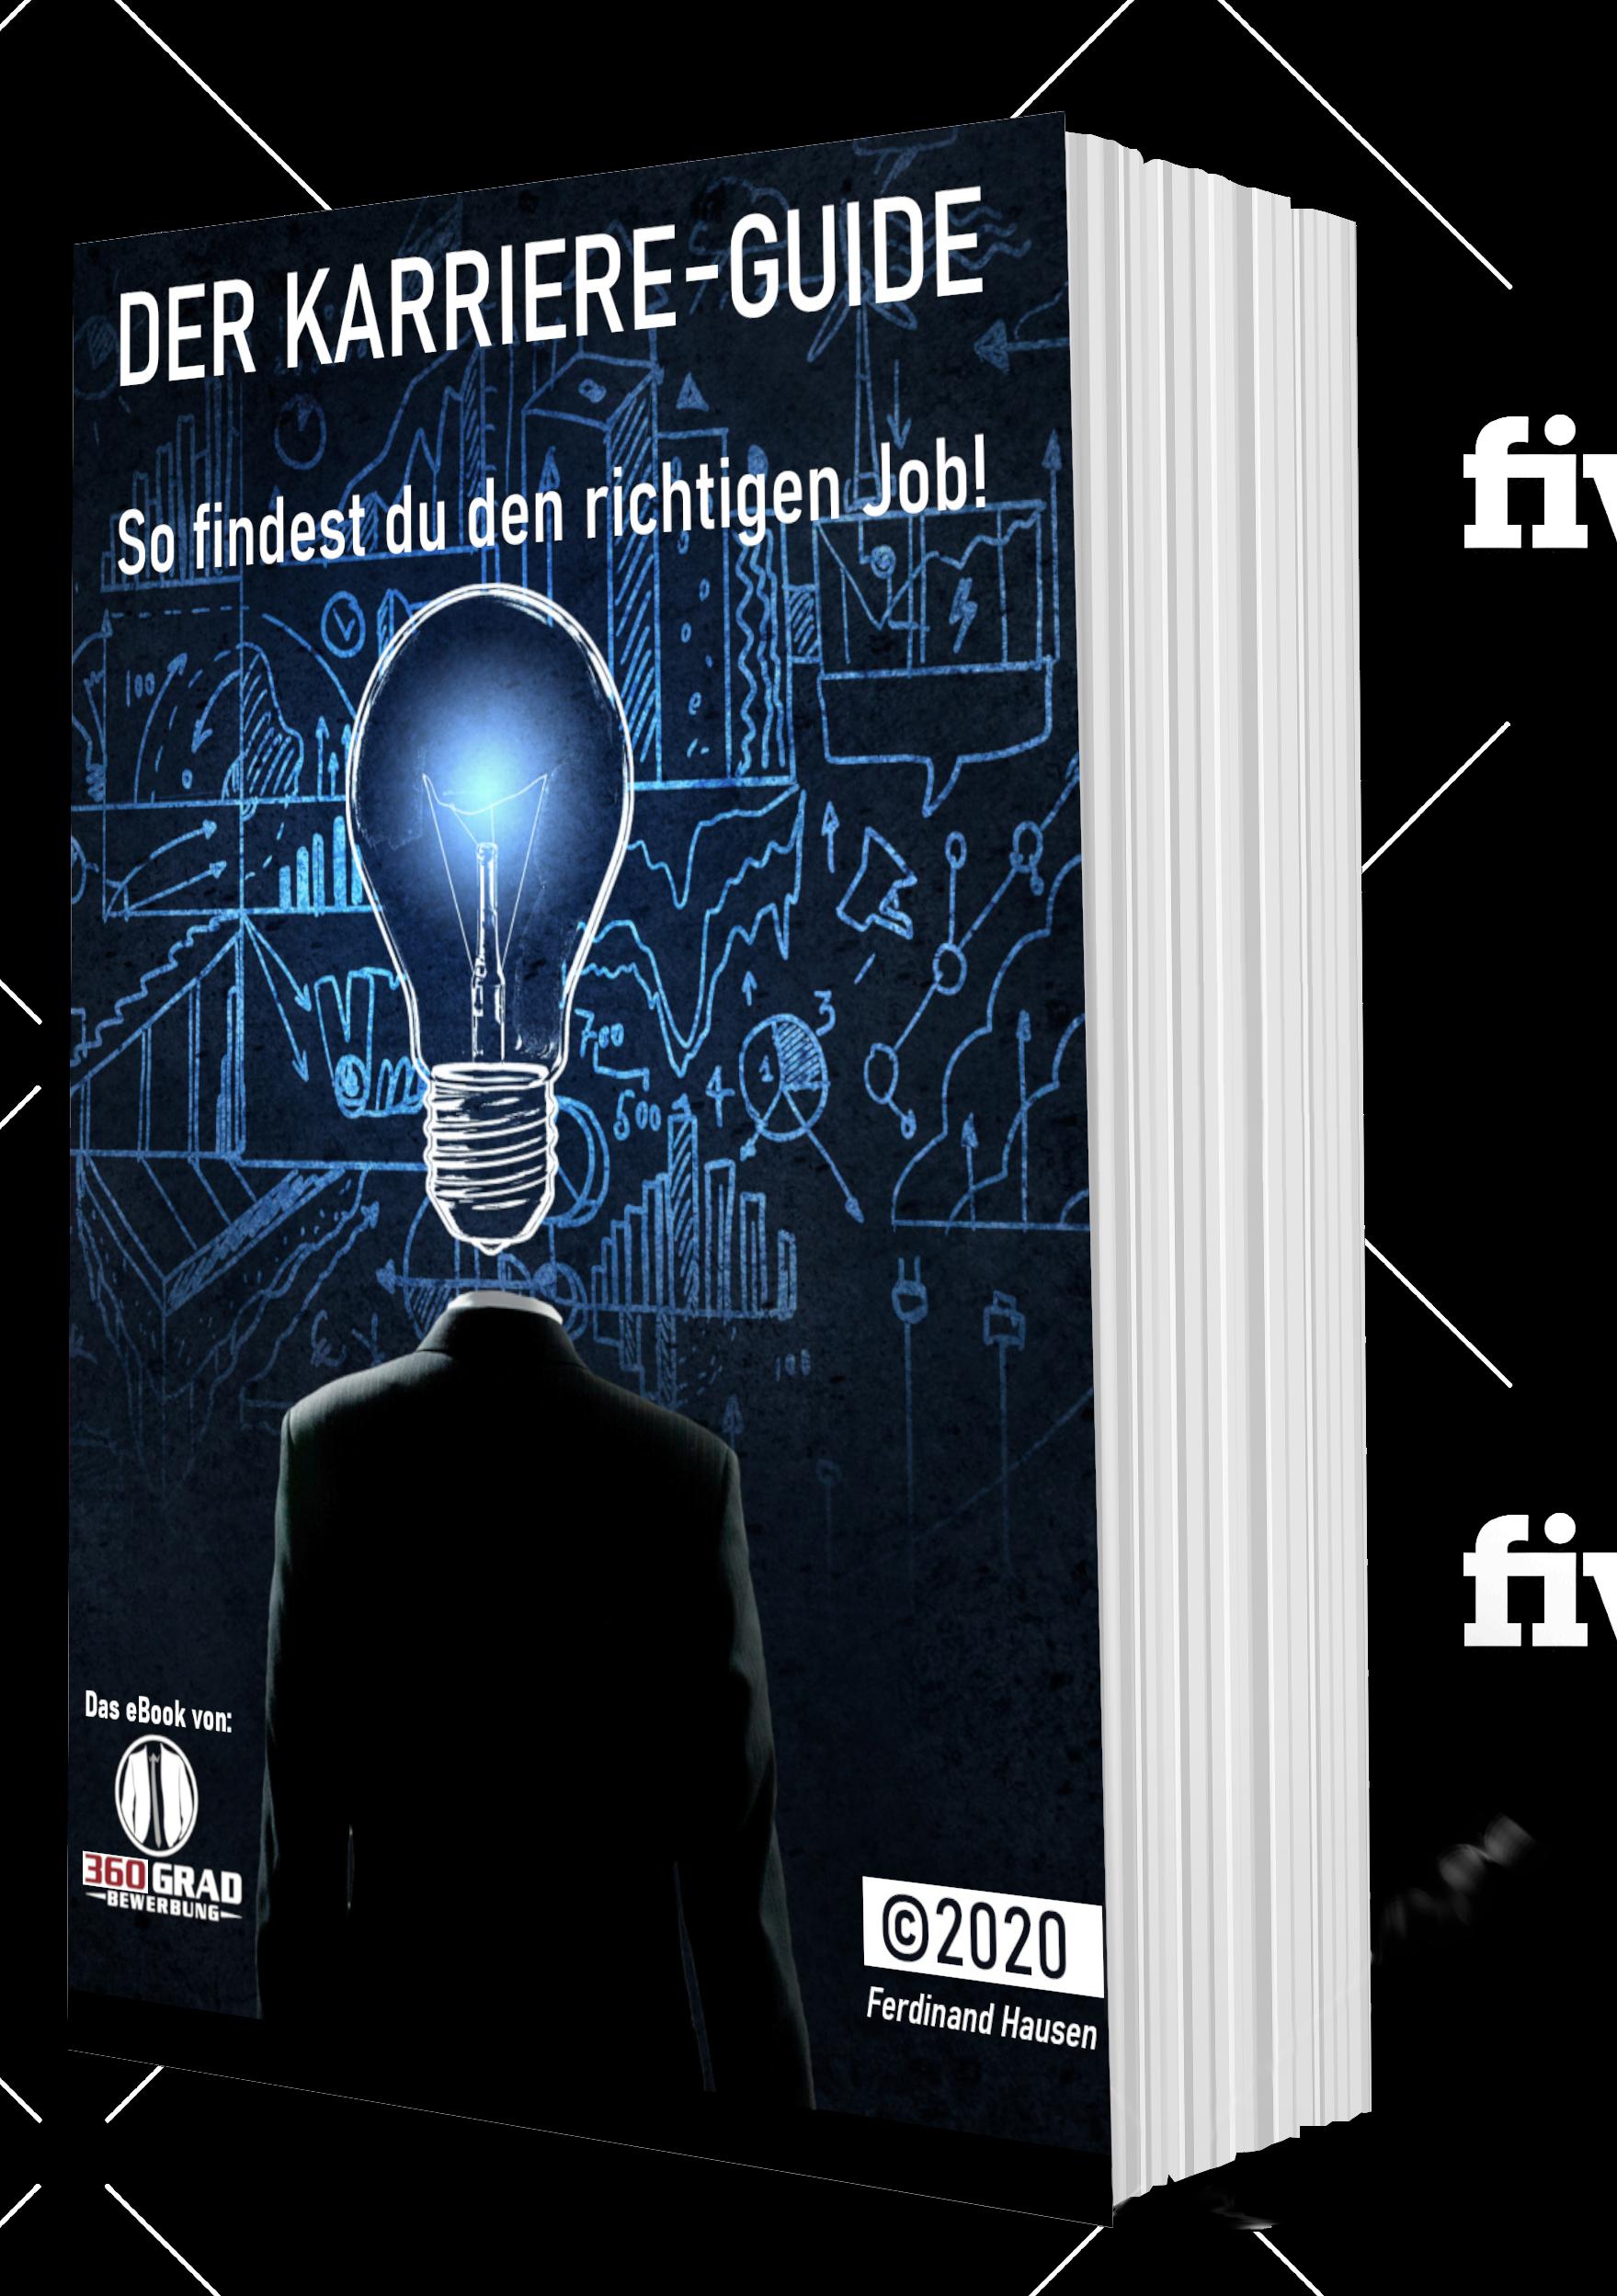 Der Bewerbungs-Guide Buchcover